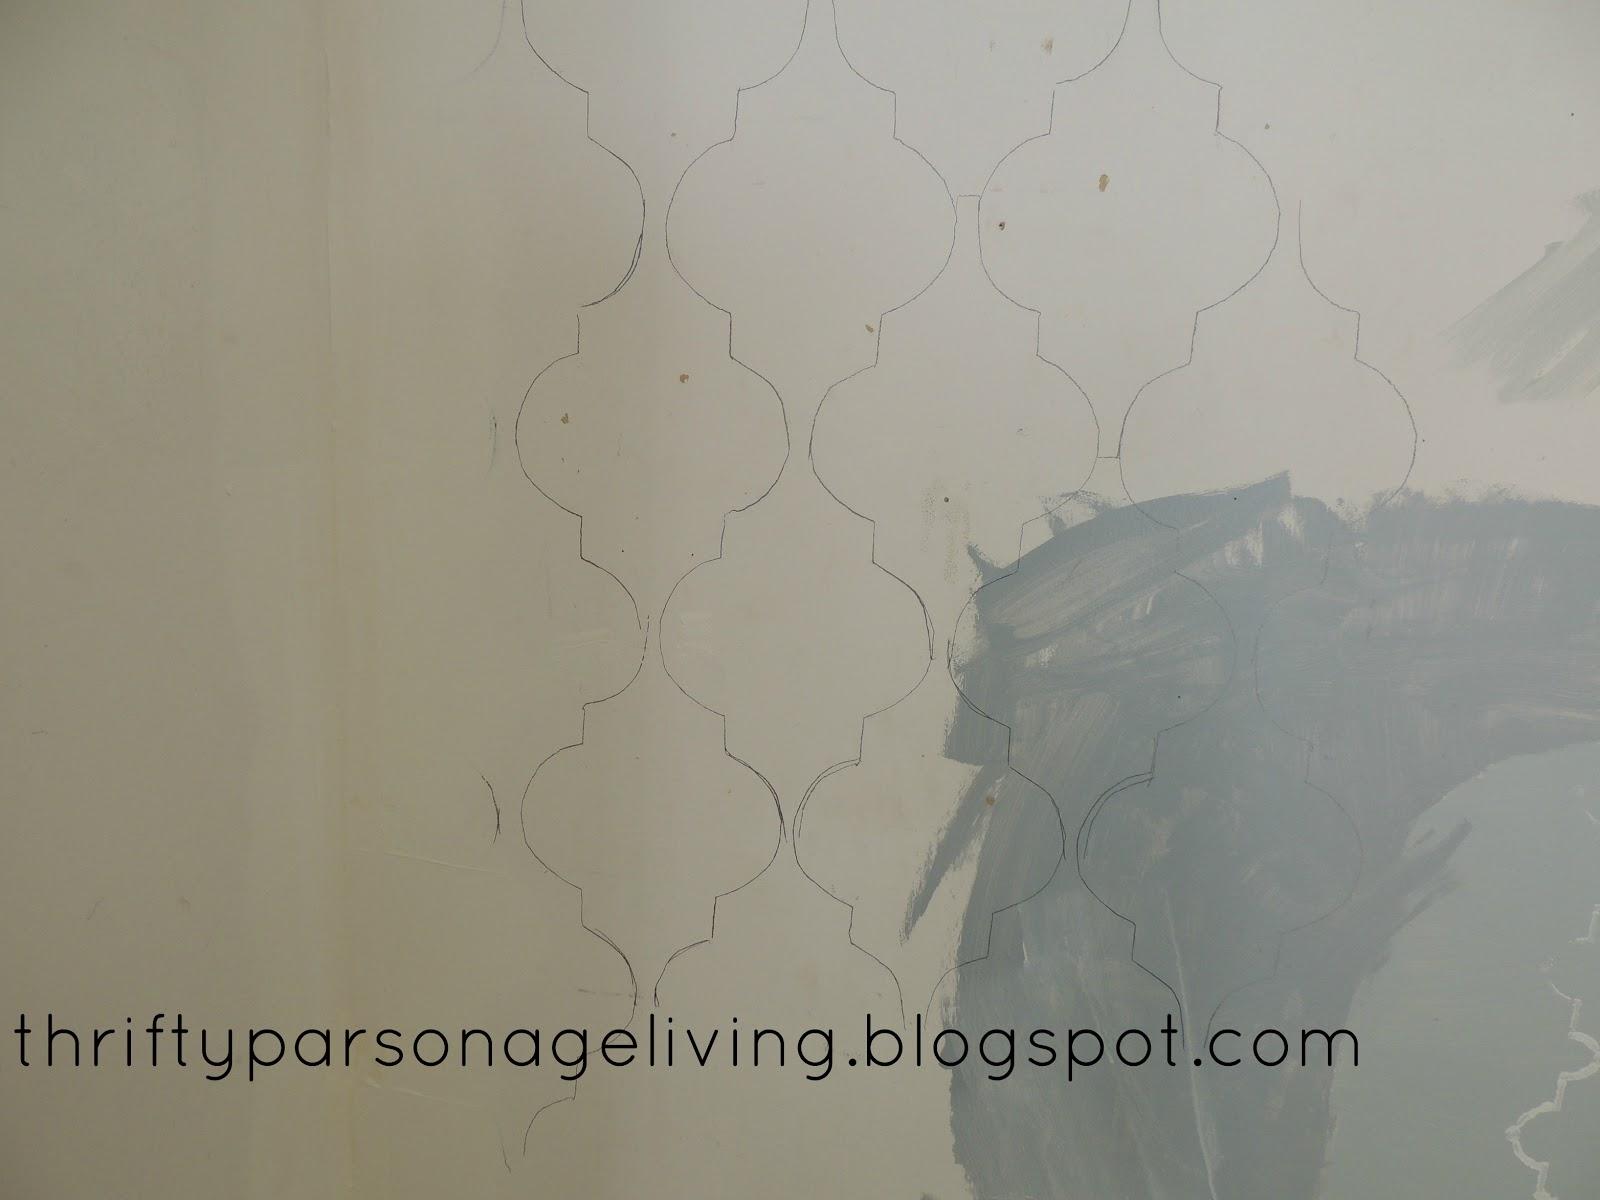 http://1.bp.blogspot.com/-kyK2PC-_tm8/UHxqVehMTPI/AAAAAAAADfQ/osMZg7zxN_c/s1600/painting+2.jpg